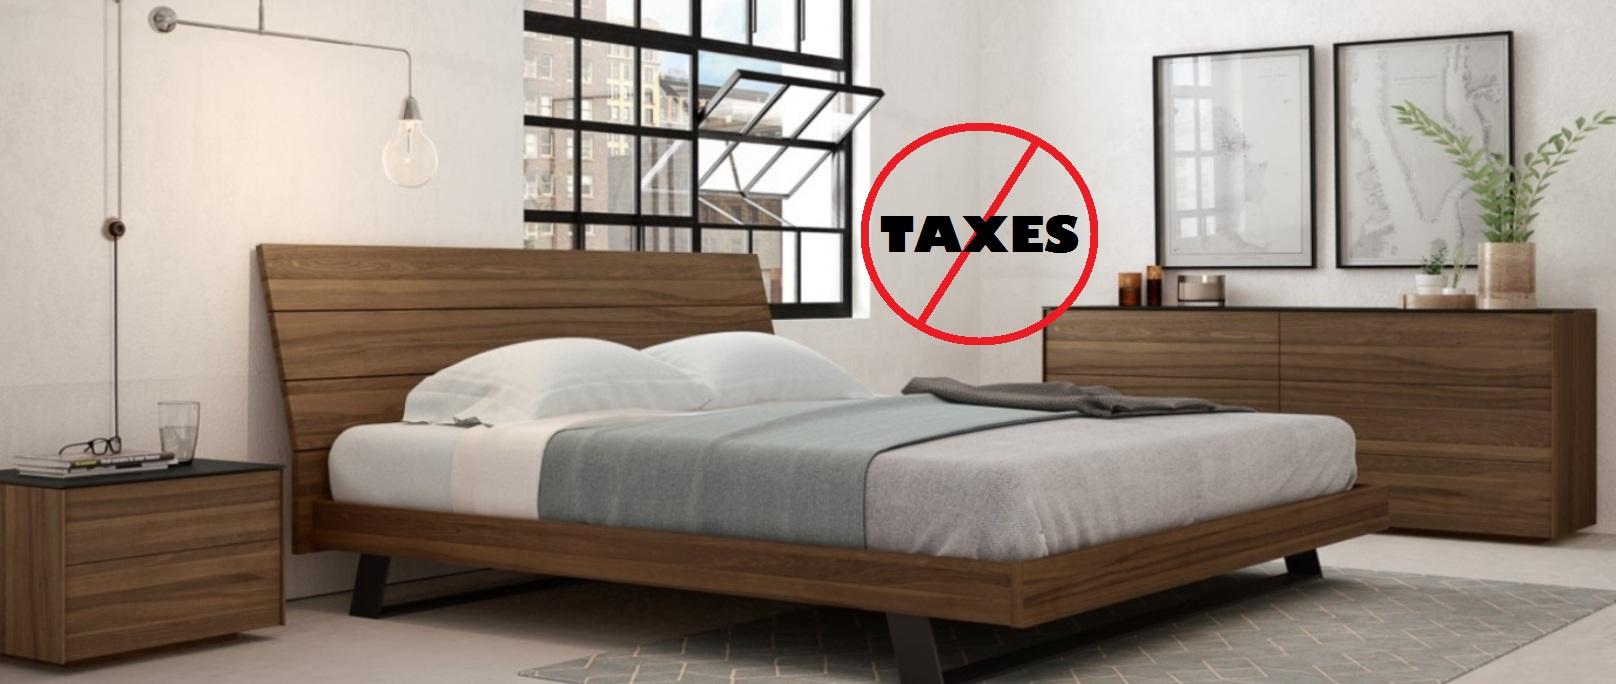 Bella-bed-Avita set Mobican Mikaza_ no tax banner